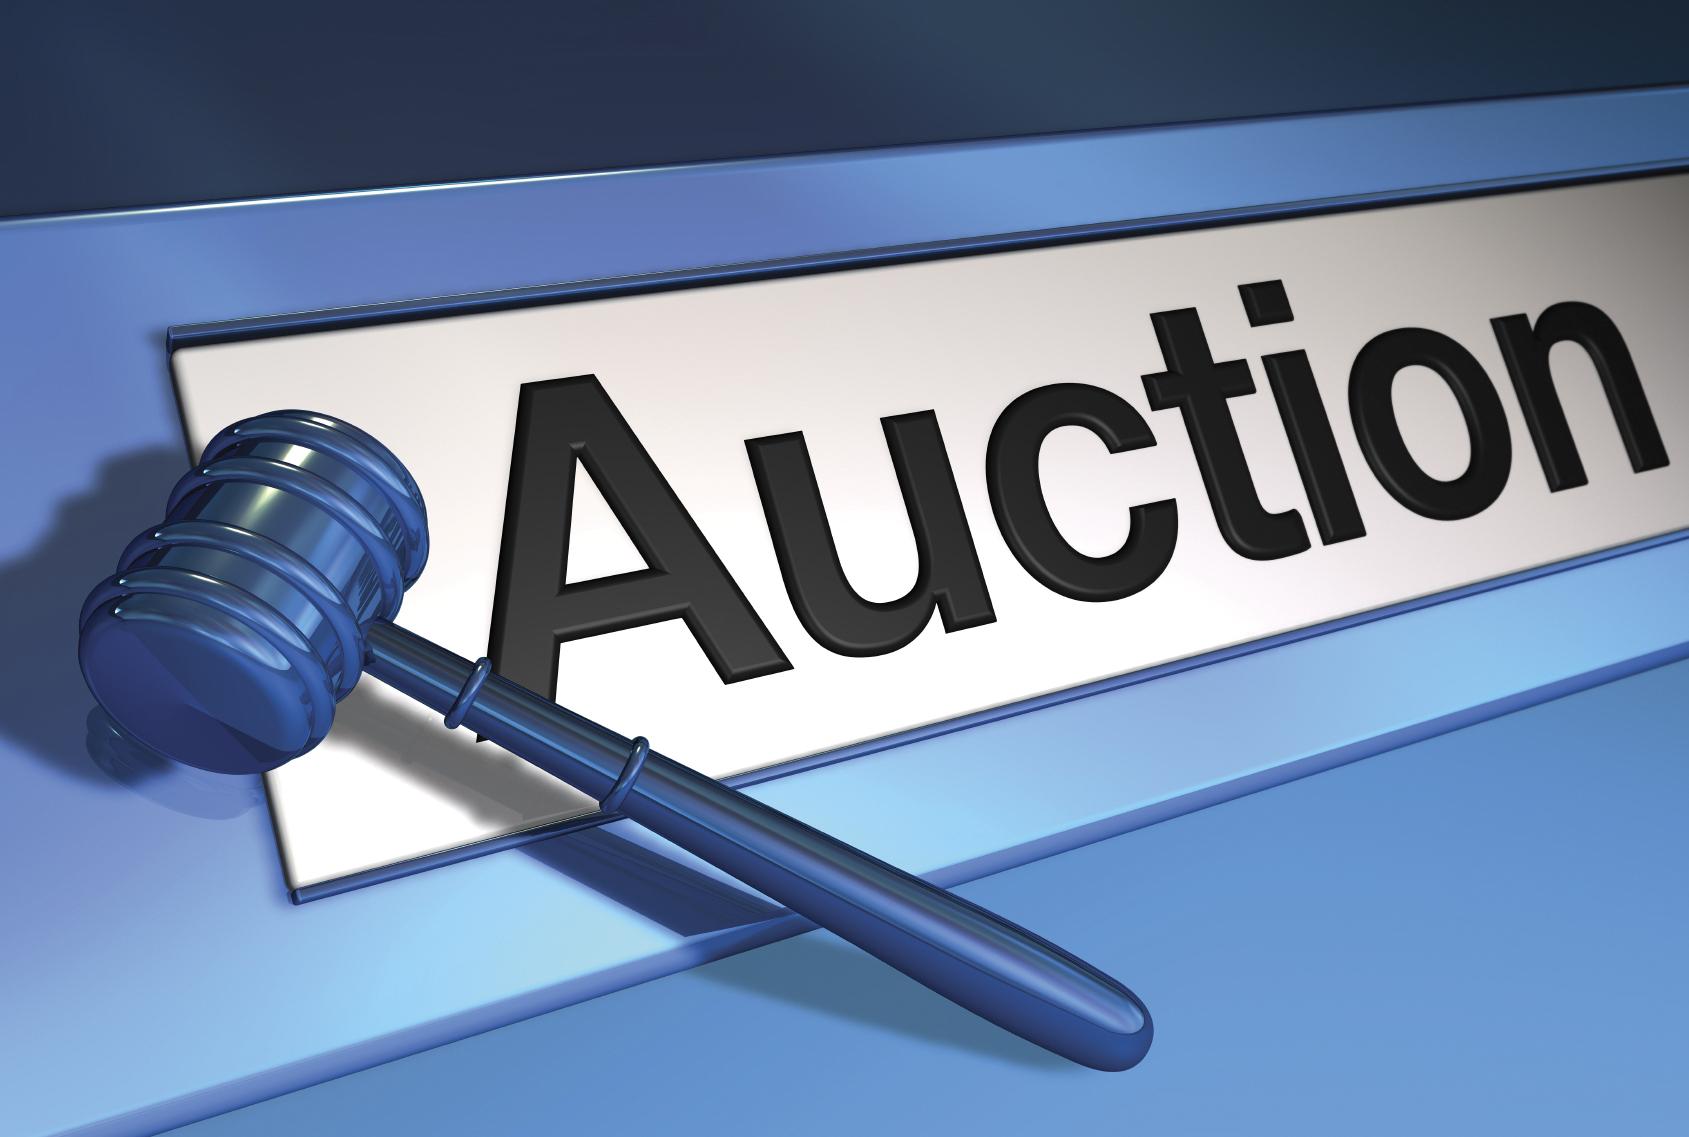 August Auctions in Philadelphia, Salt Lake City, New York and Kentucky